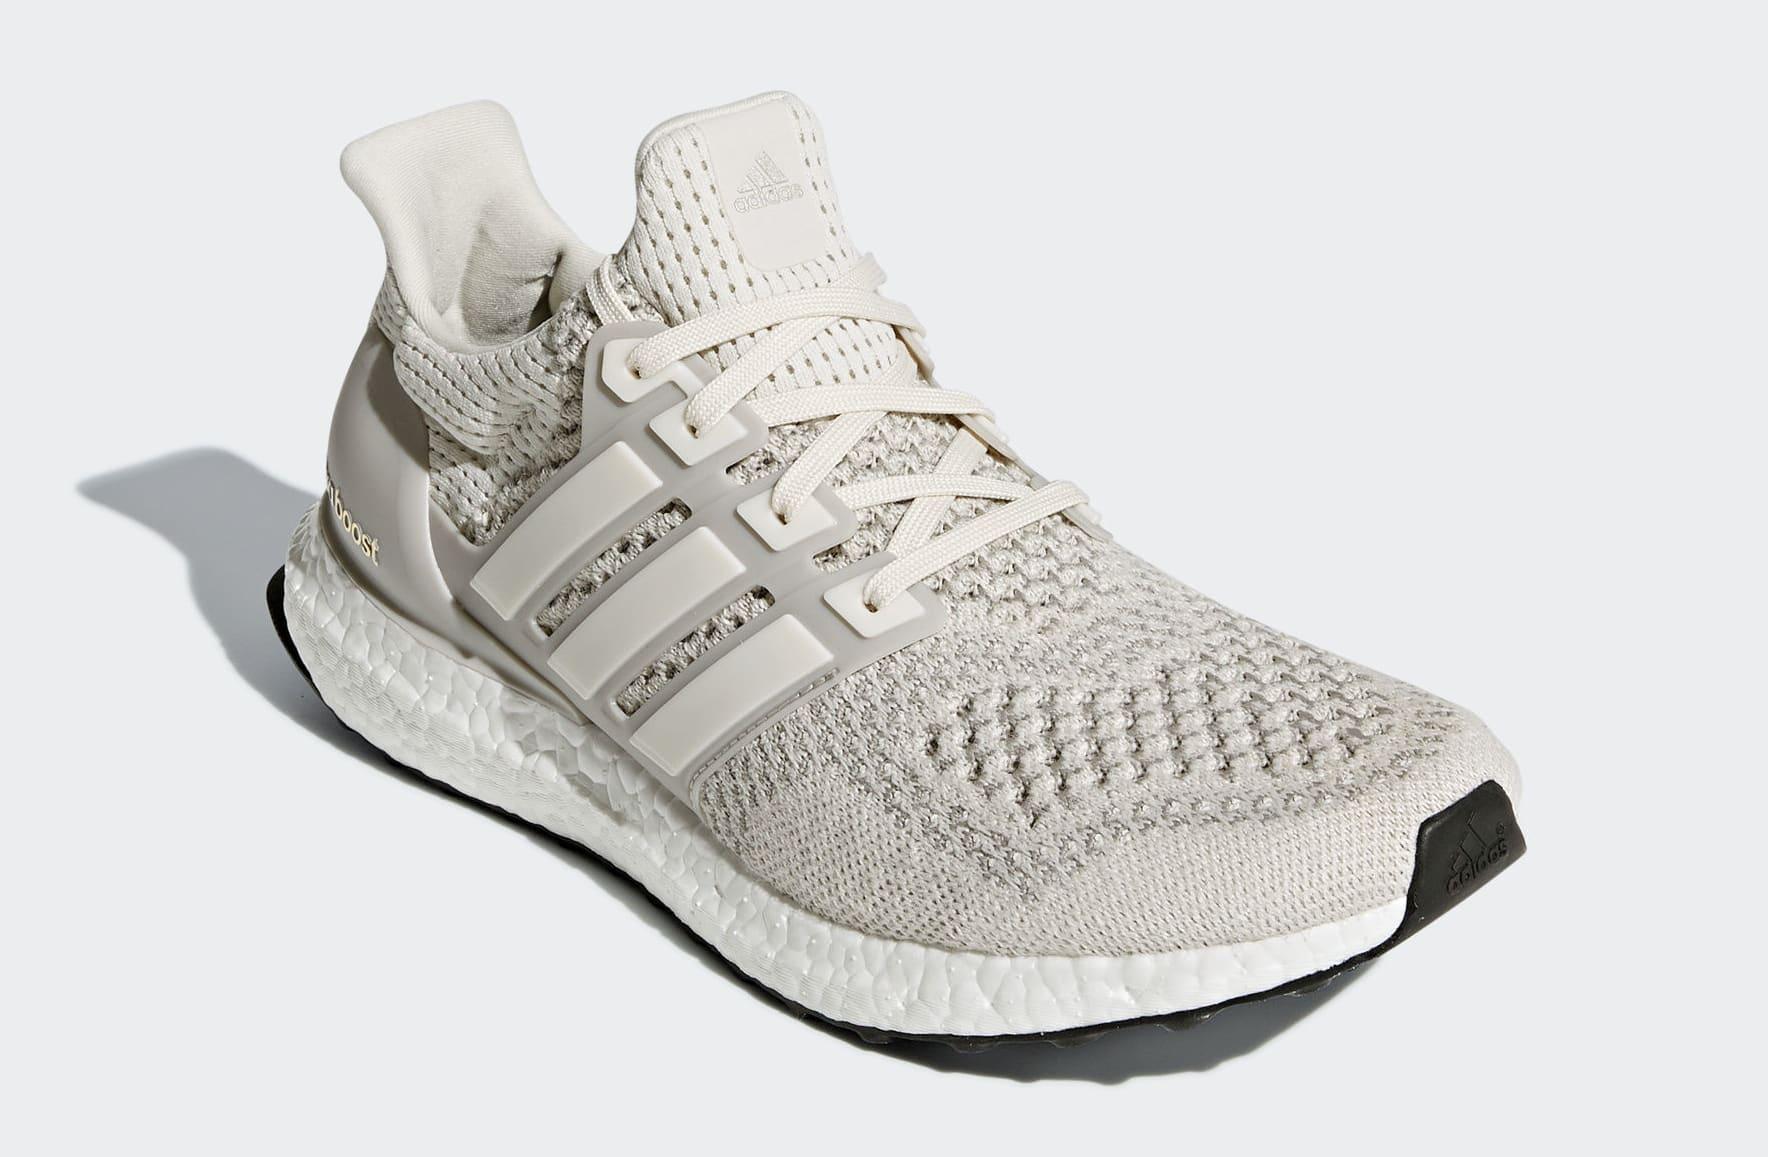 Adidas Ultra Boost 1.0 'Cream' BB7802 (Toe)